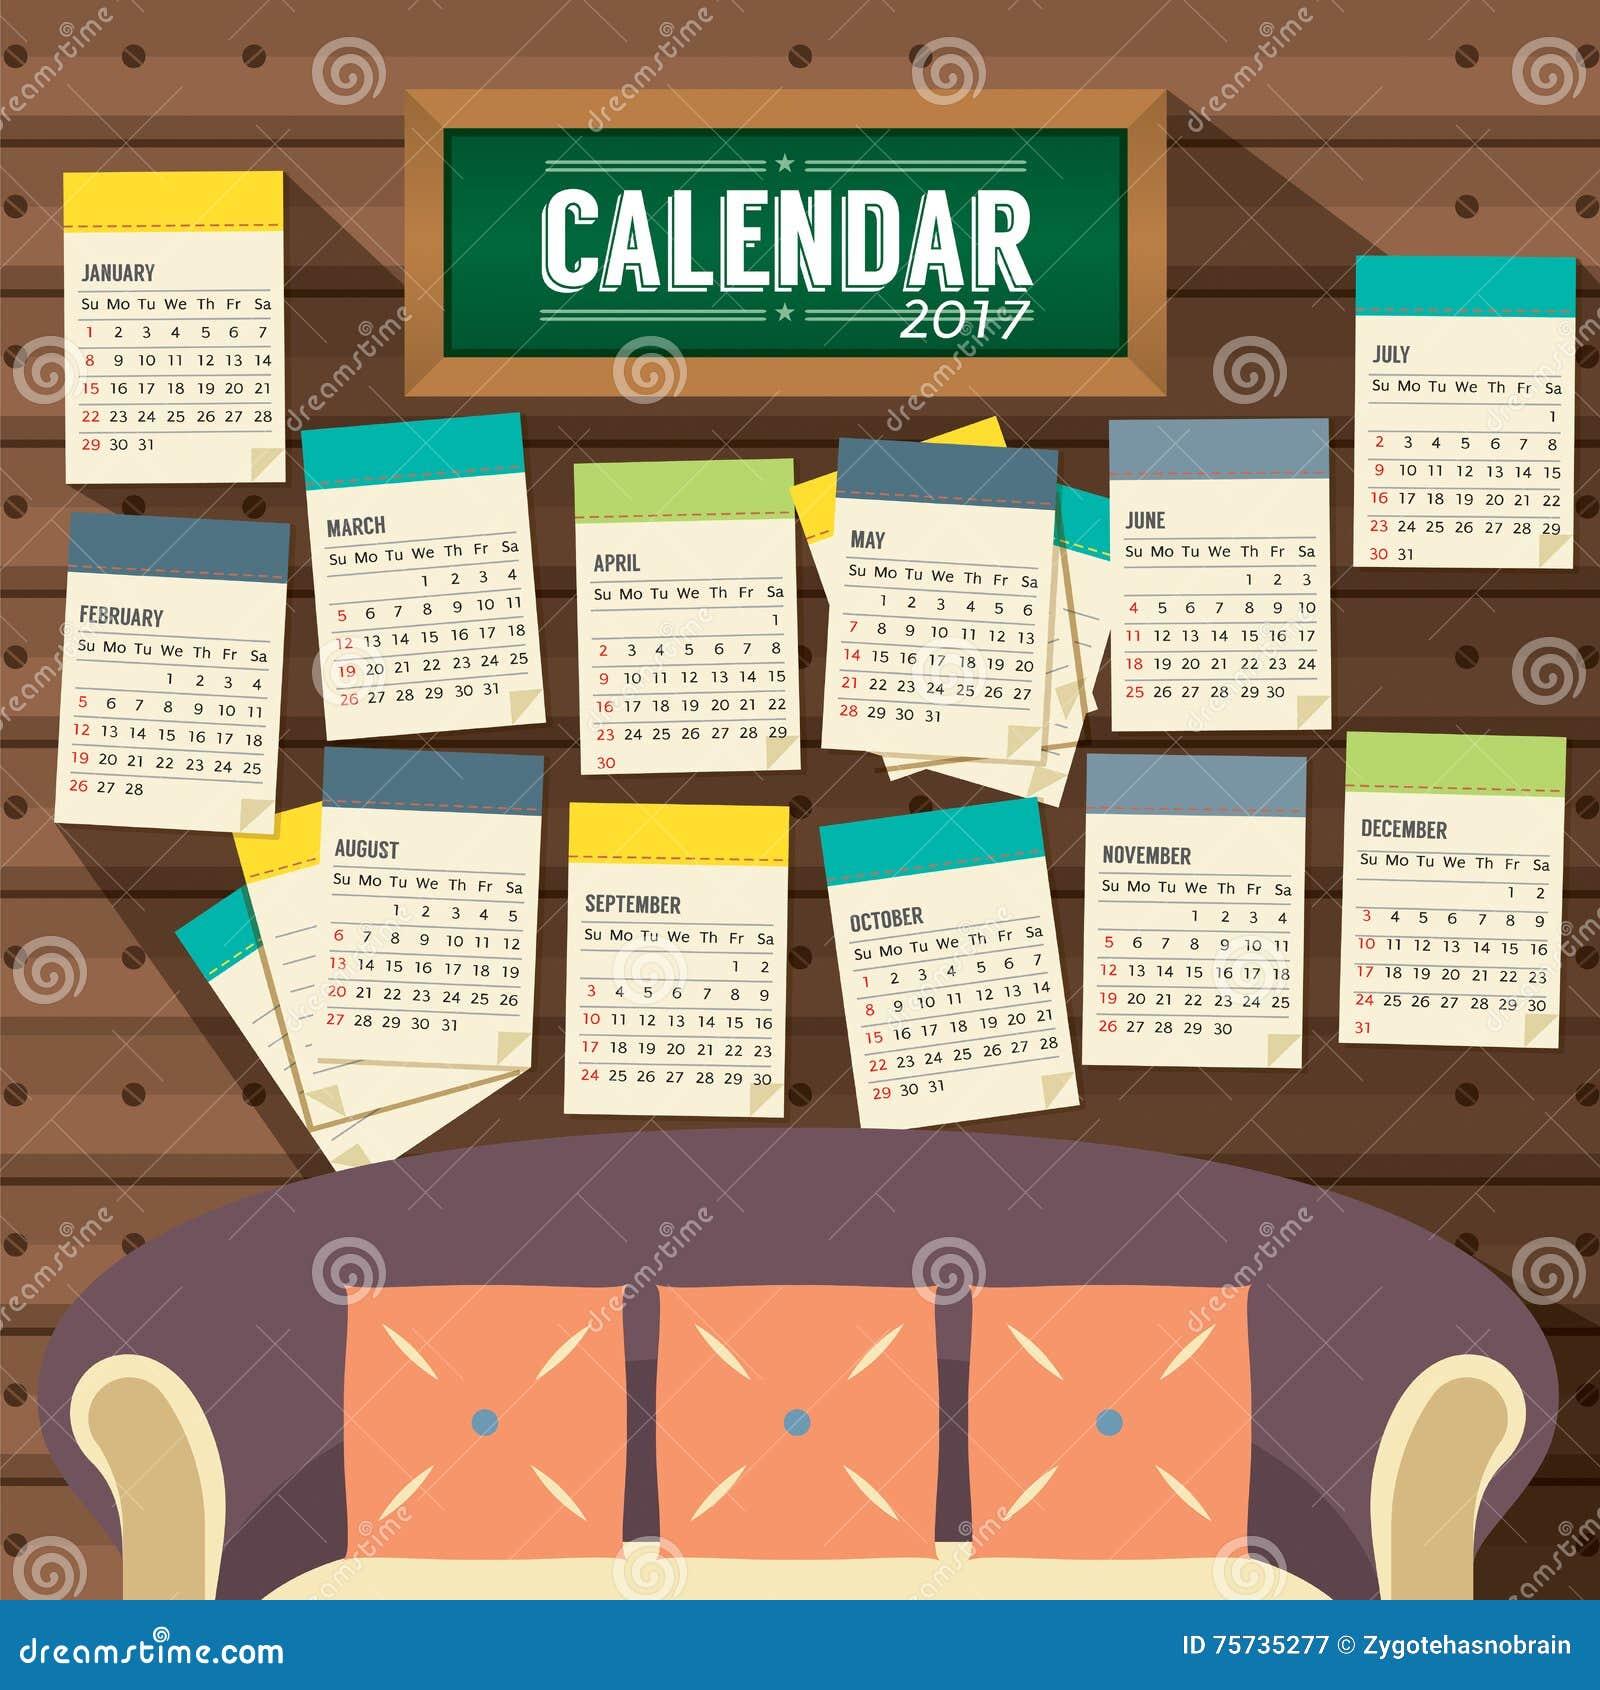 Calendar Flat Illustration : Flat design living room printable calendar starts